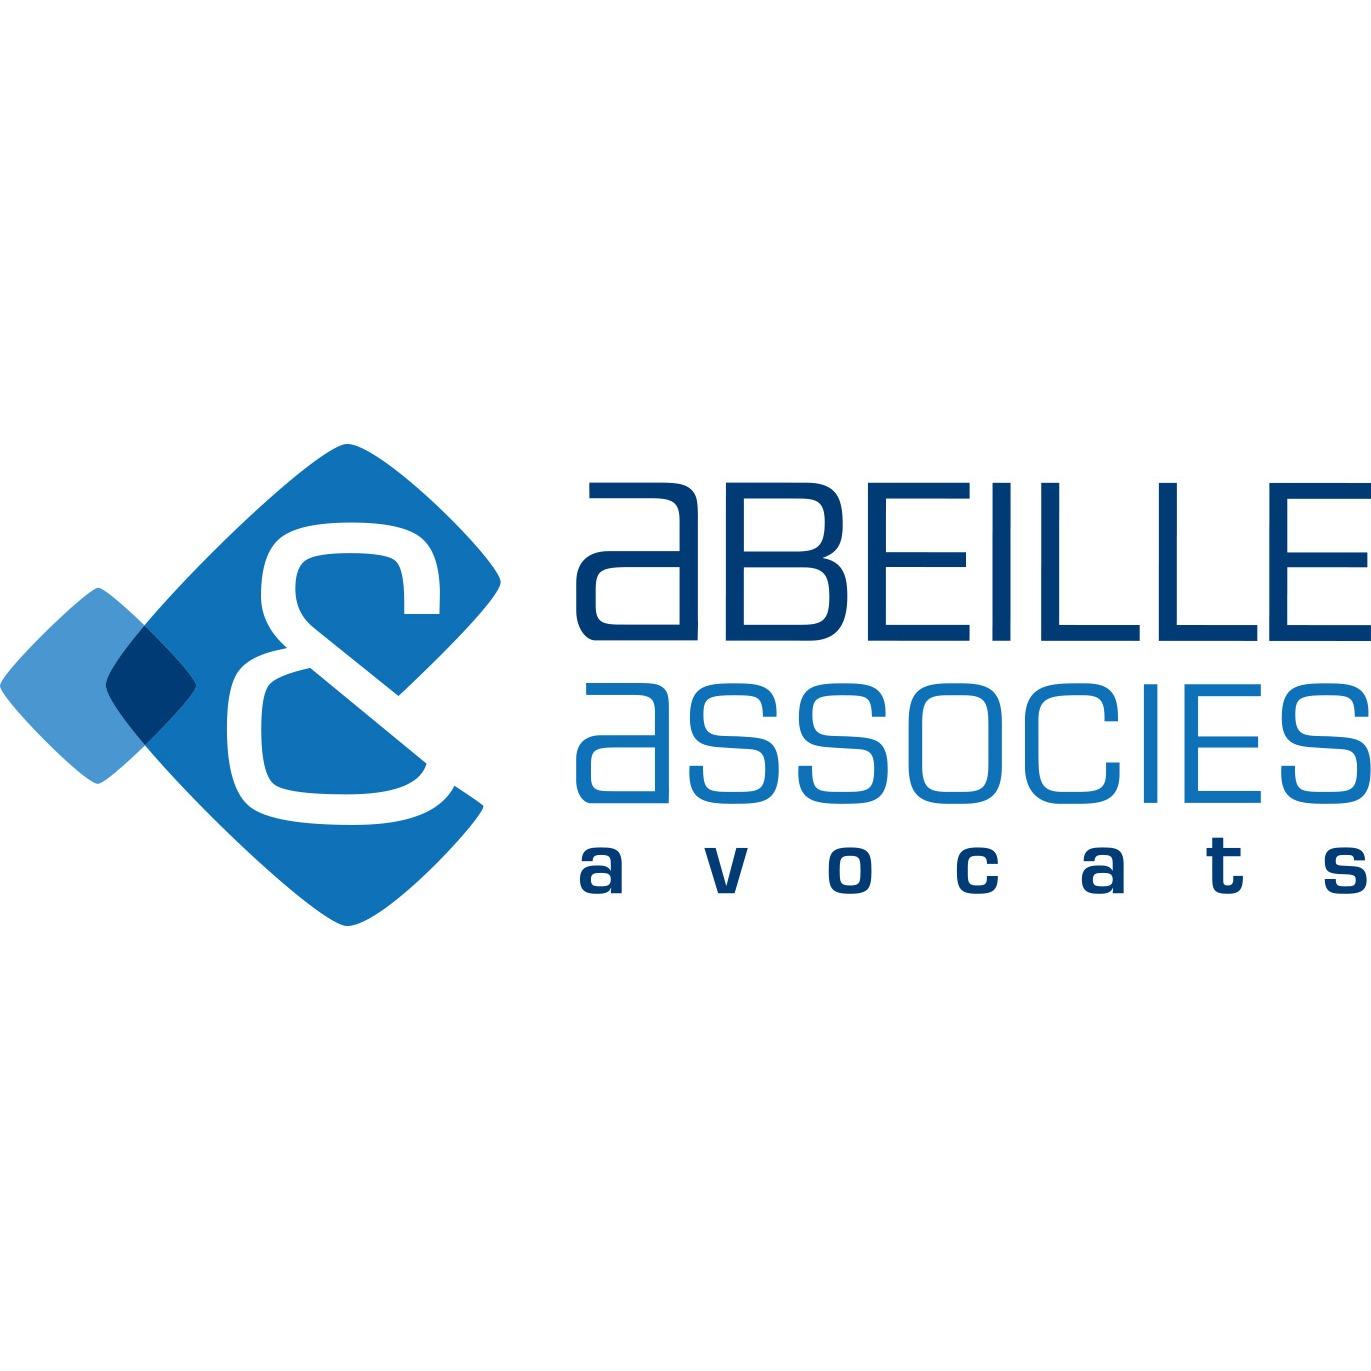 the Abeille & Associés logo.